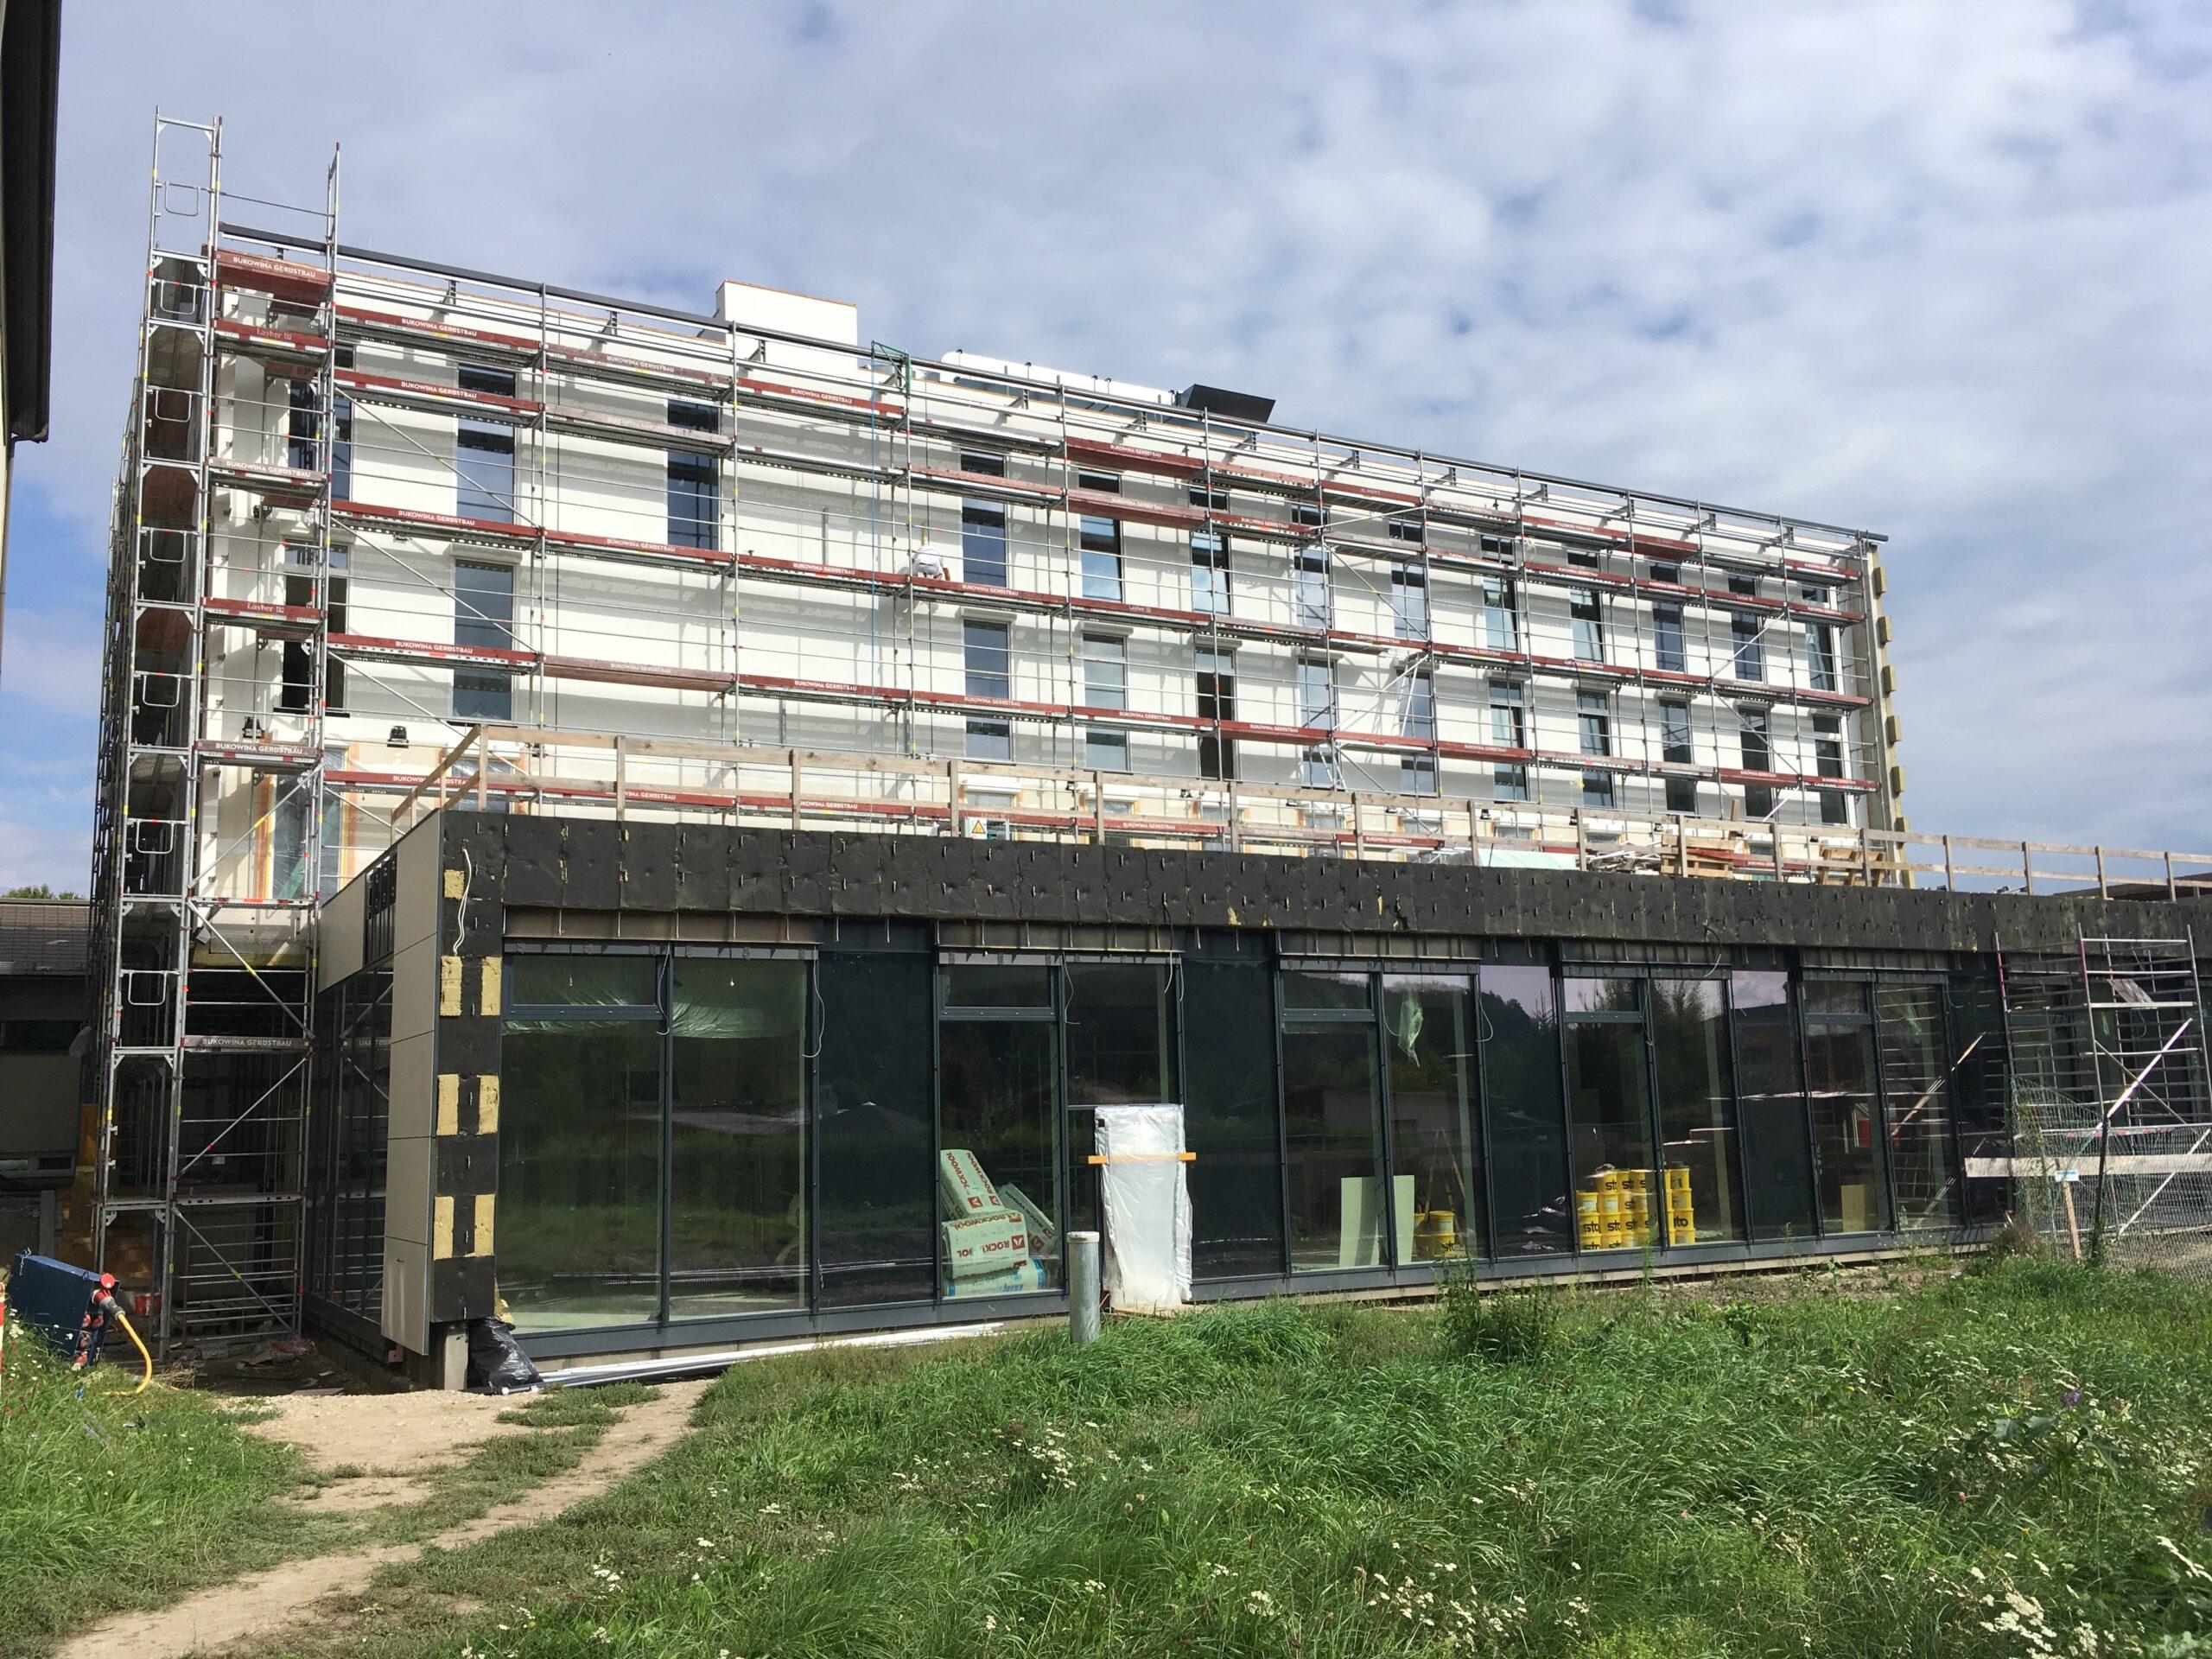 ÖBB apprentice home St. Pölten